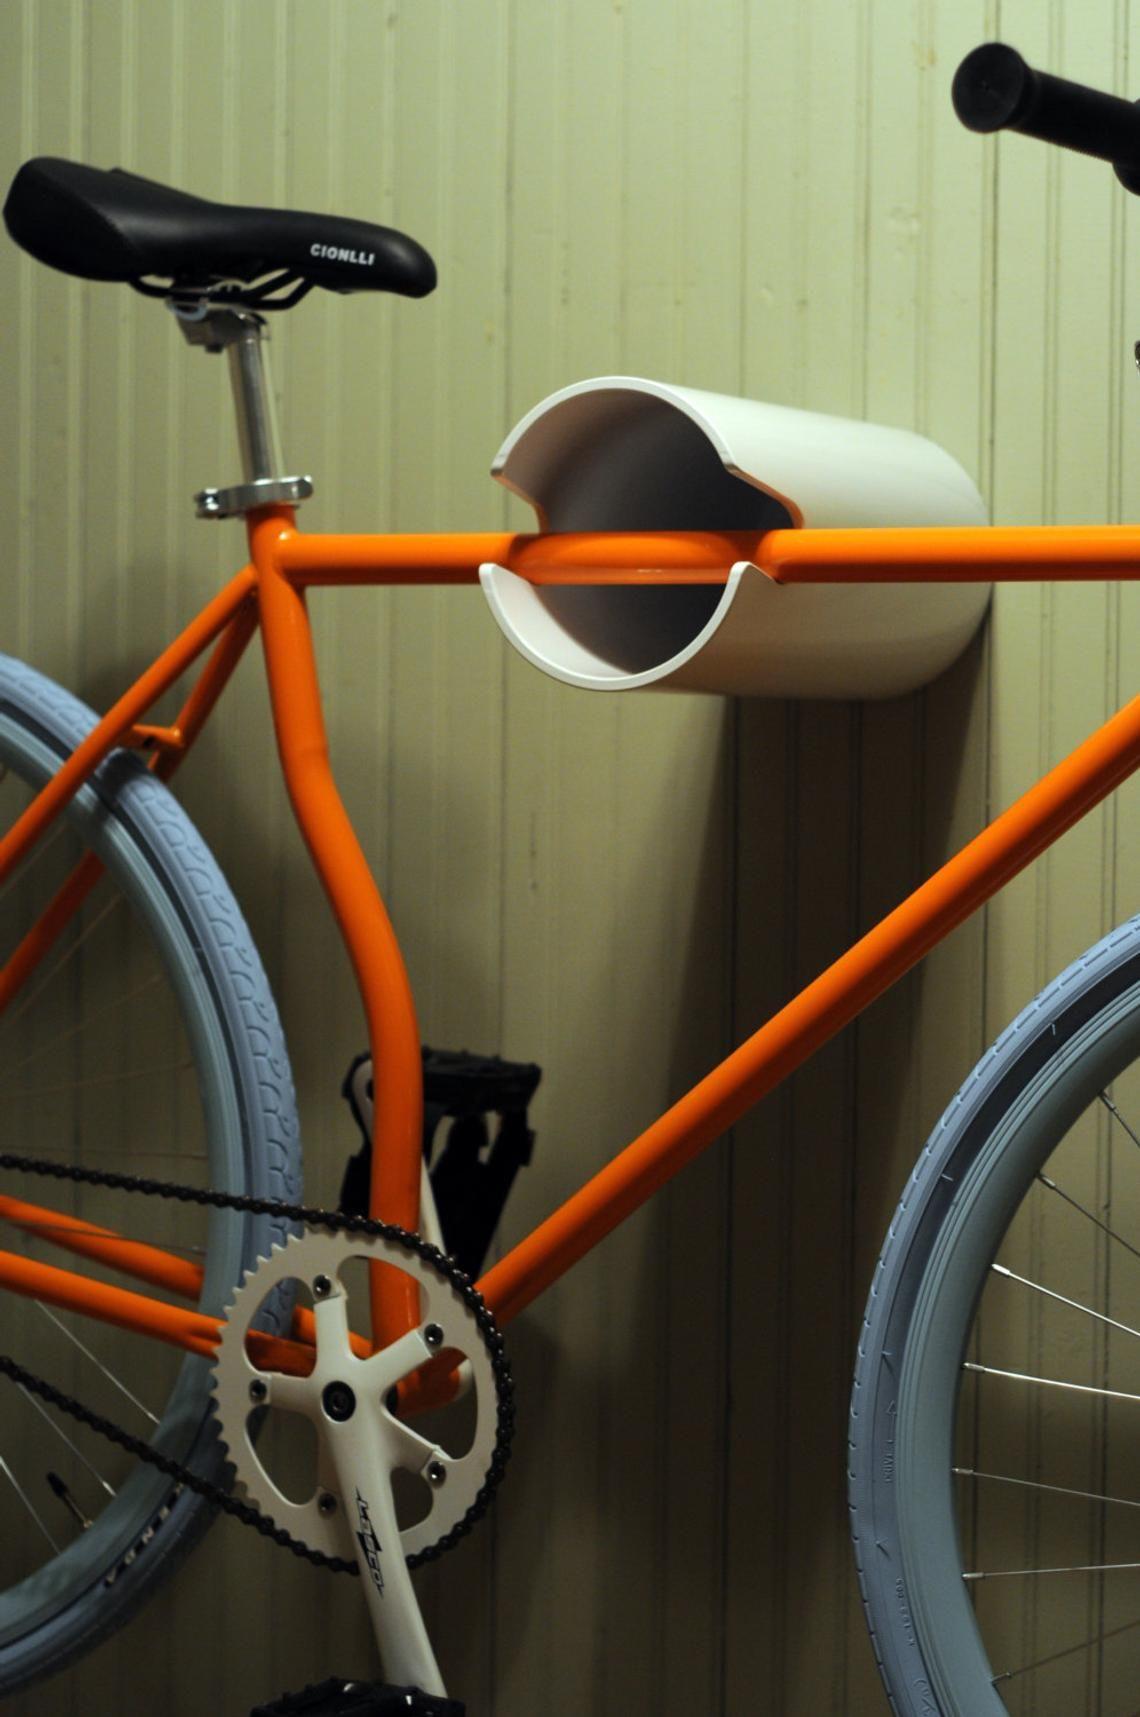 wall bike rack hanging display